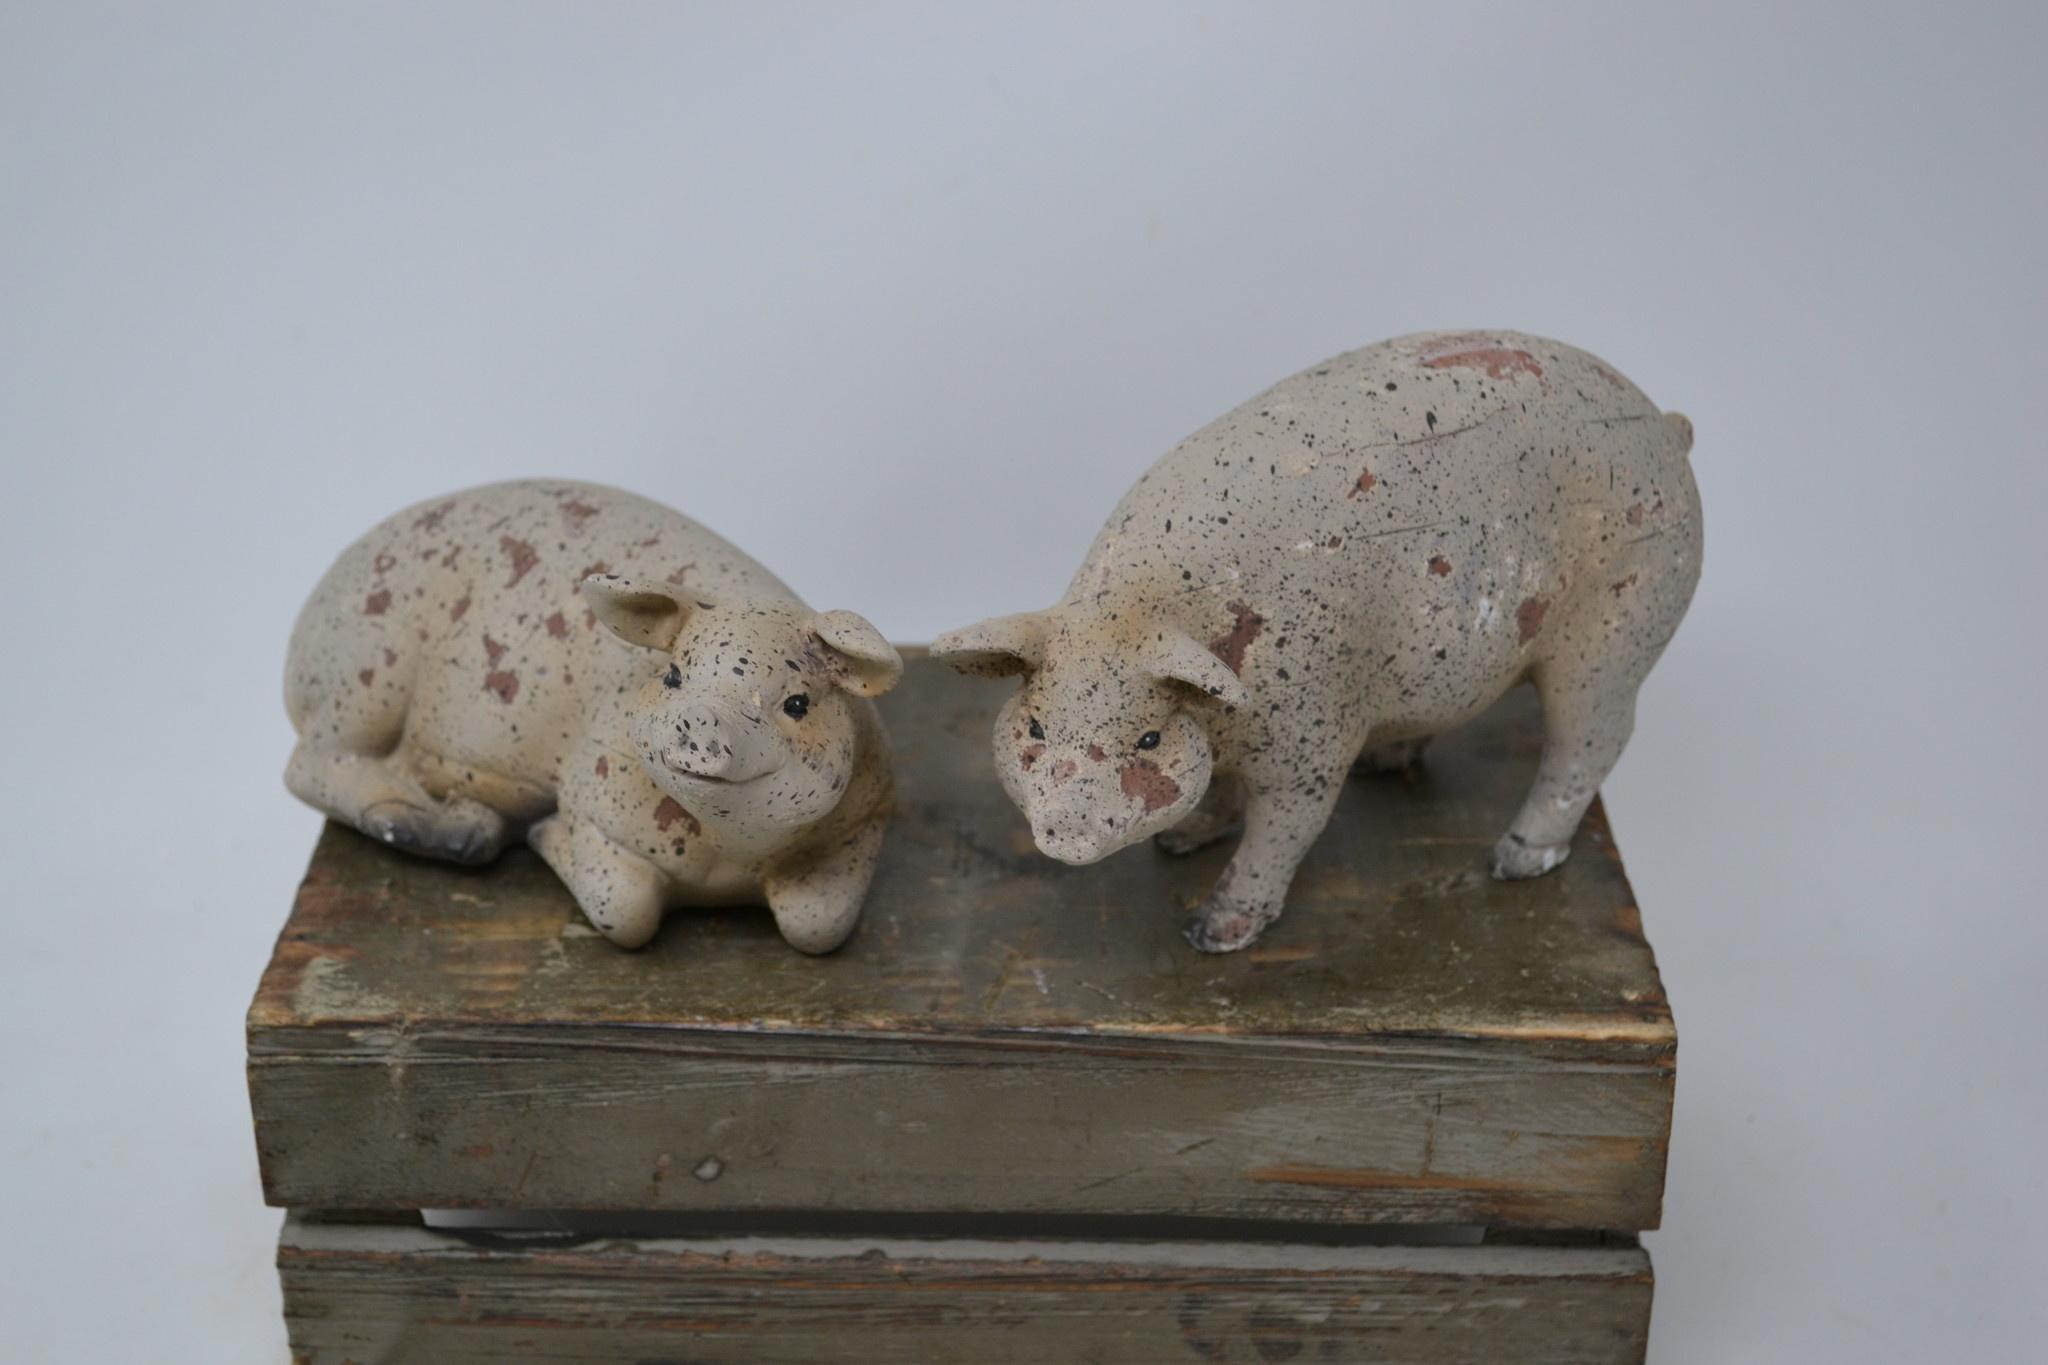 Set of 2 Rustic Pigs